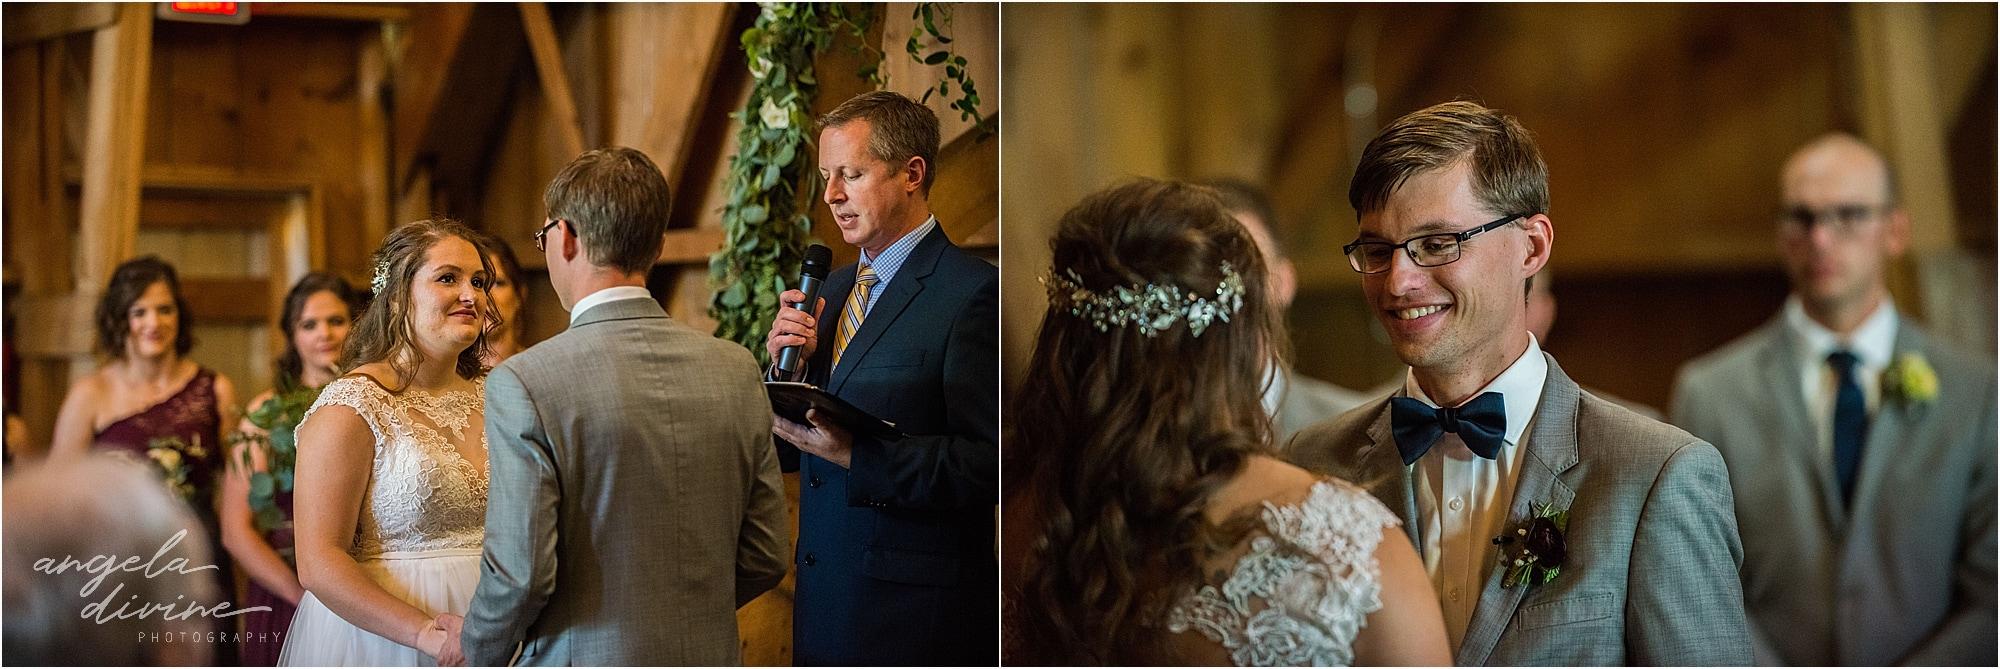 The Cottage Farmhouse Wedding Ceremony barn